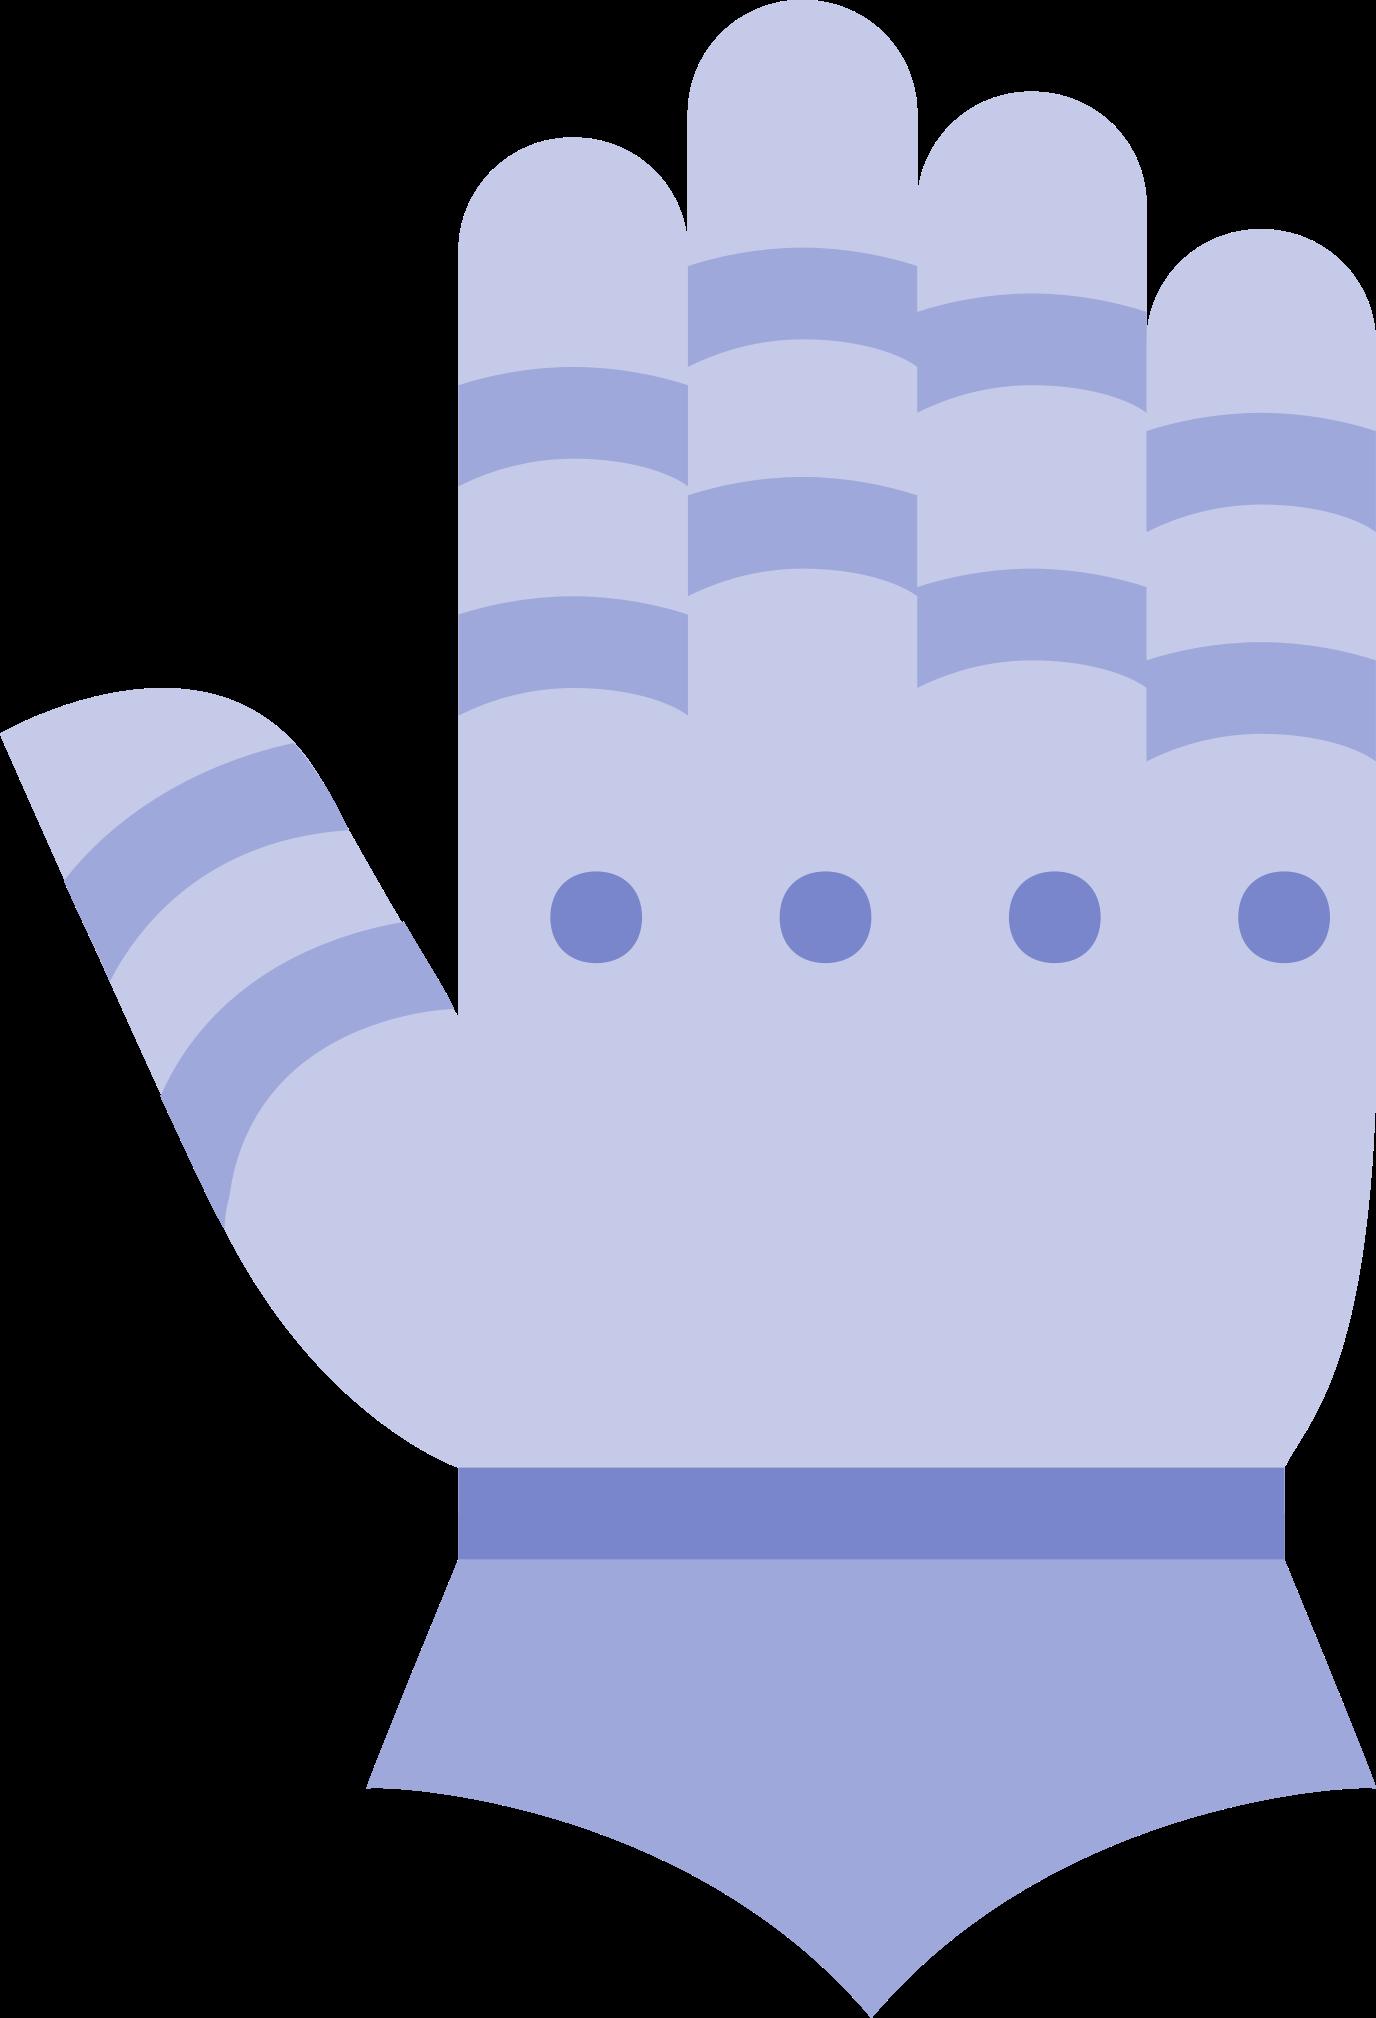 Gloves big image png. Glove clipart blue glove